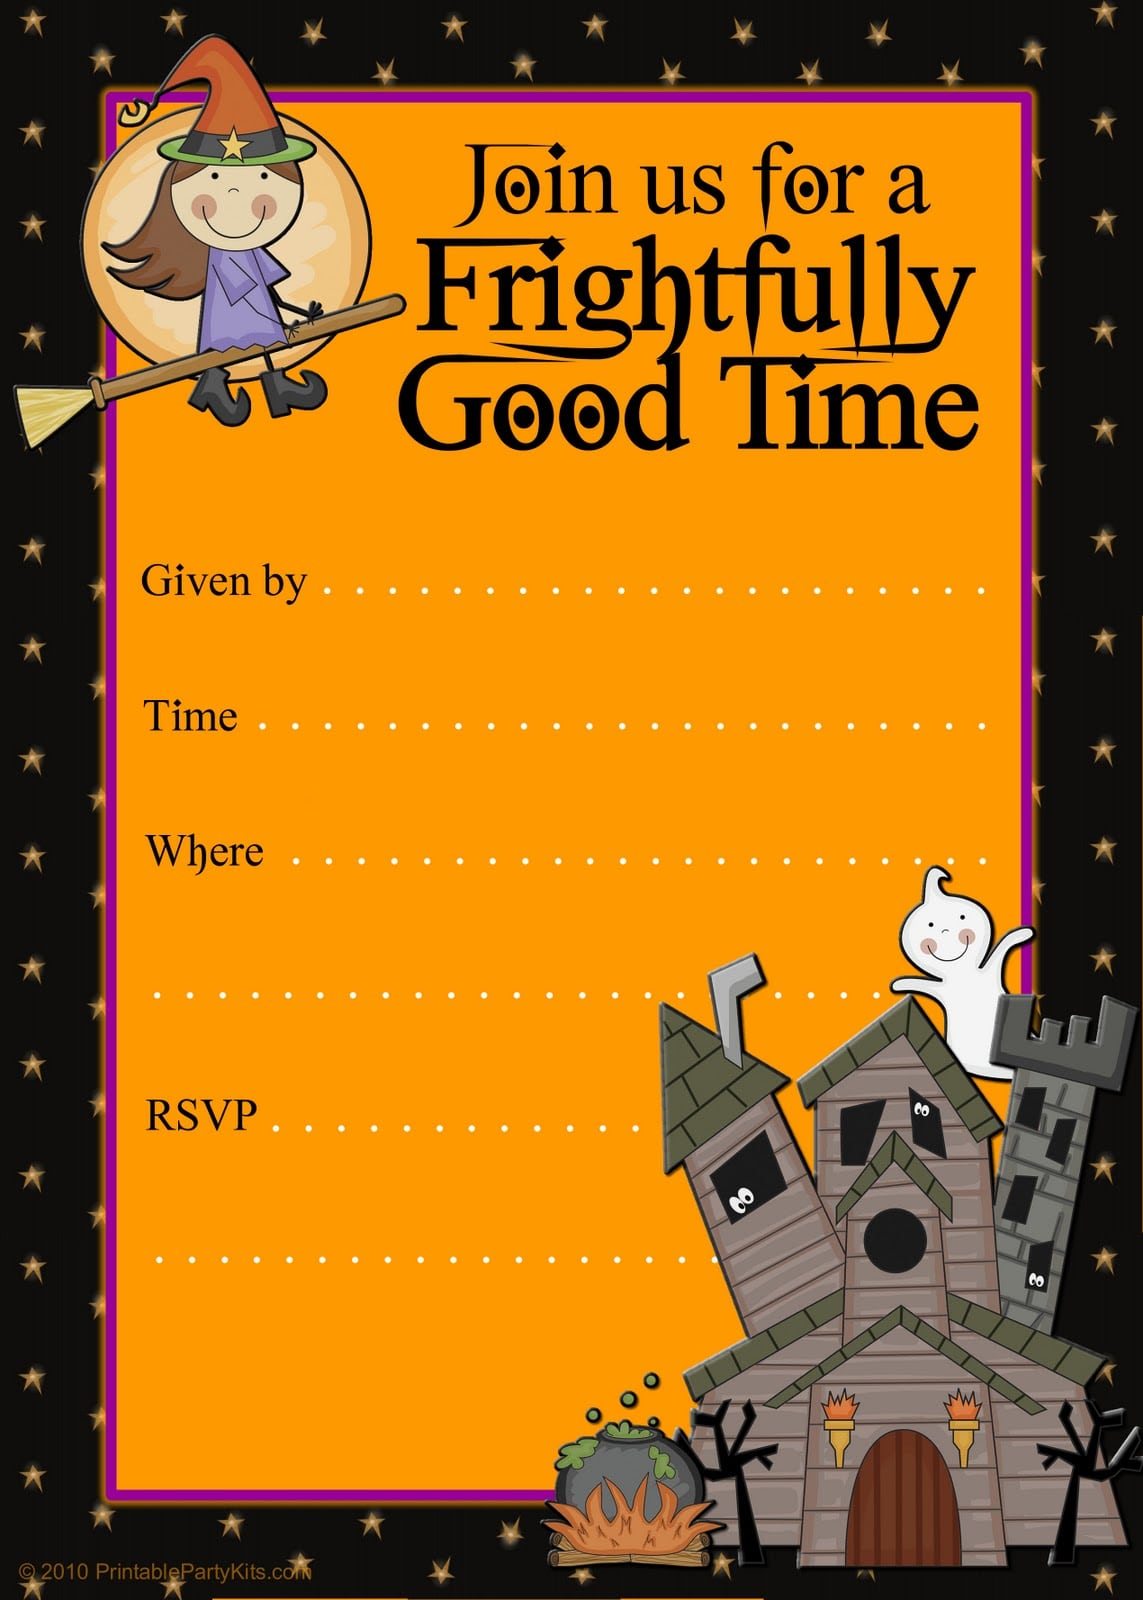 Free Printable Halloween Birthday Party Invitations Elegant Free